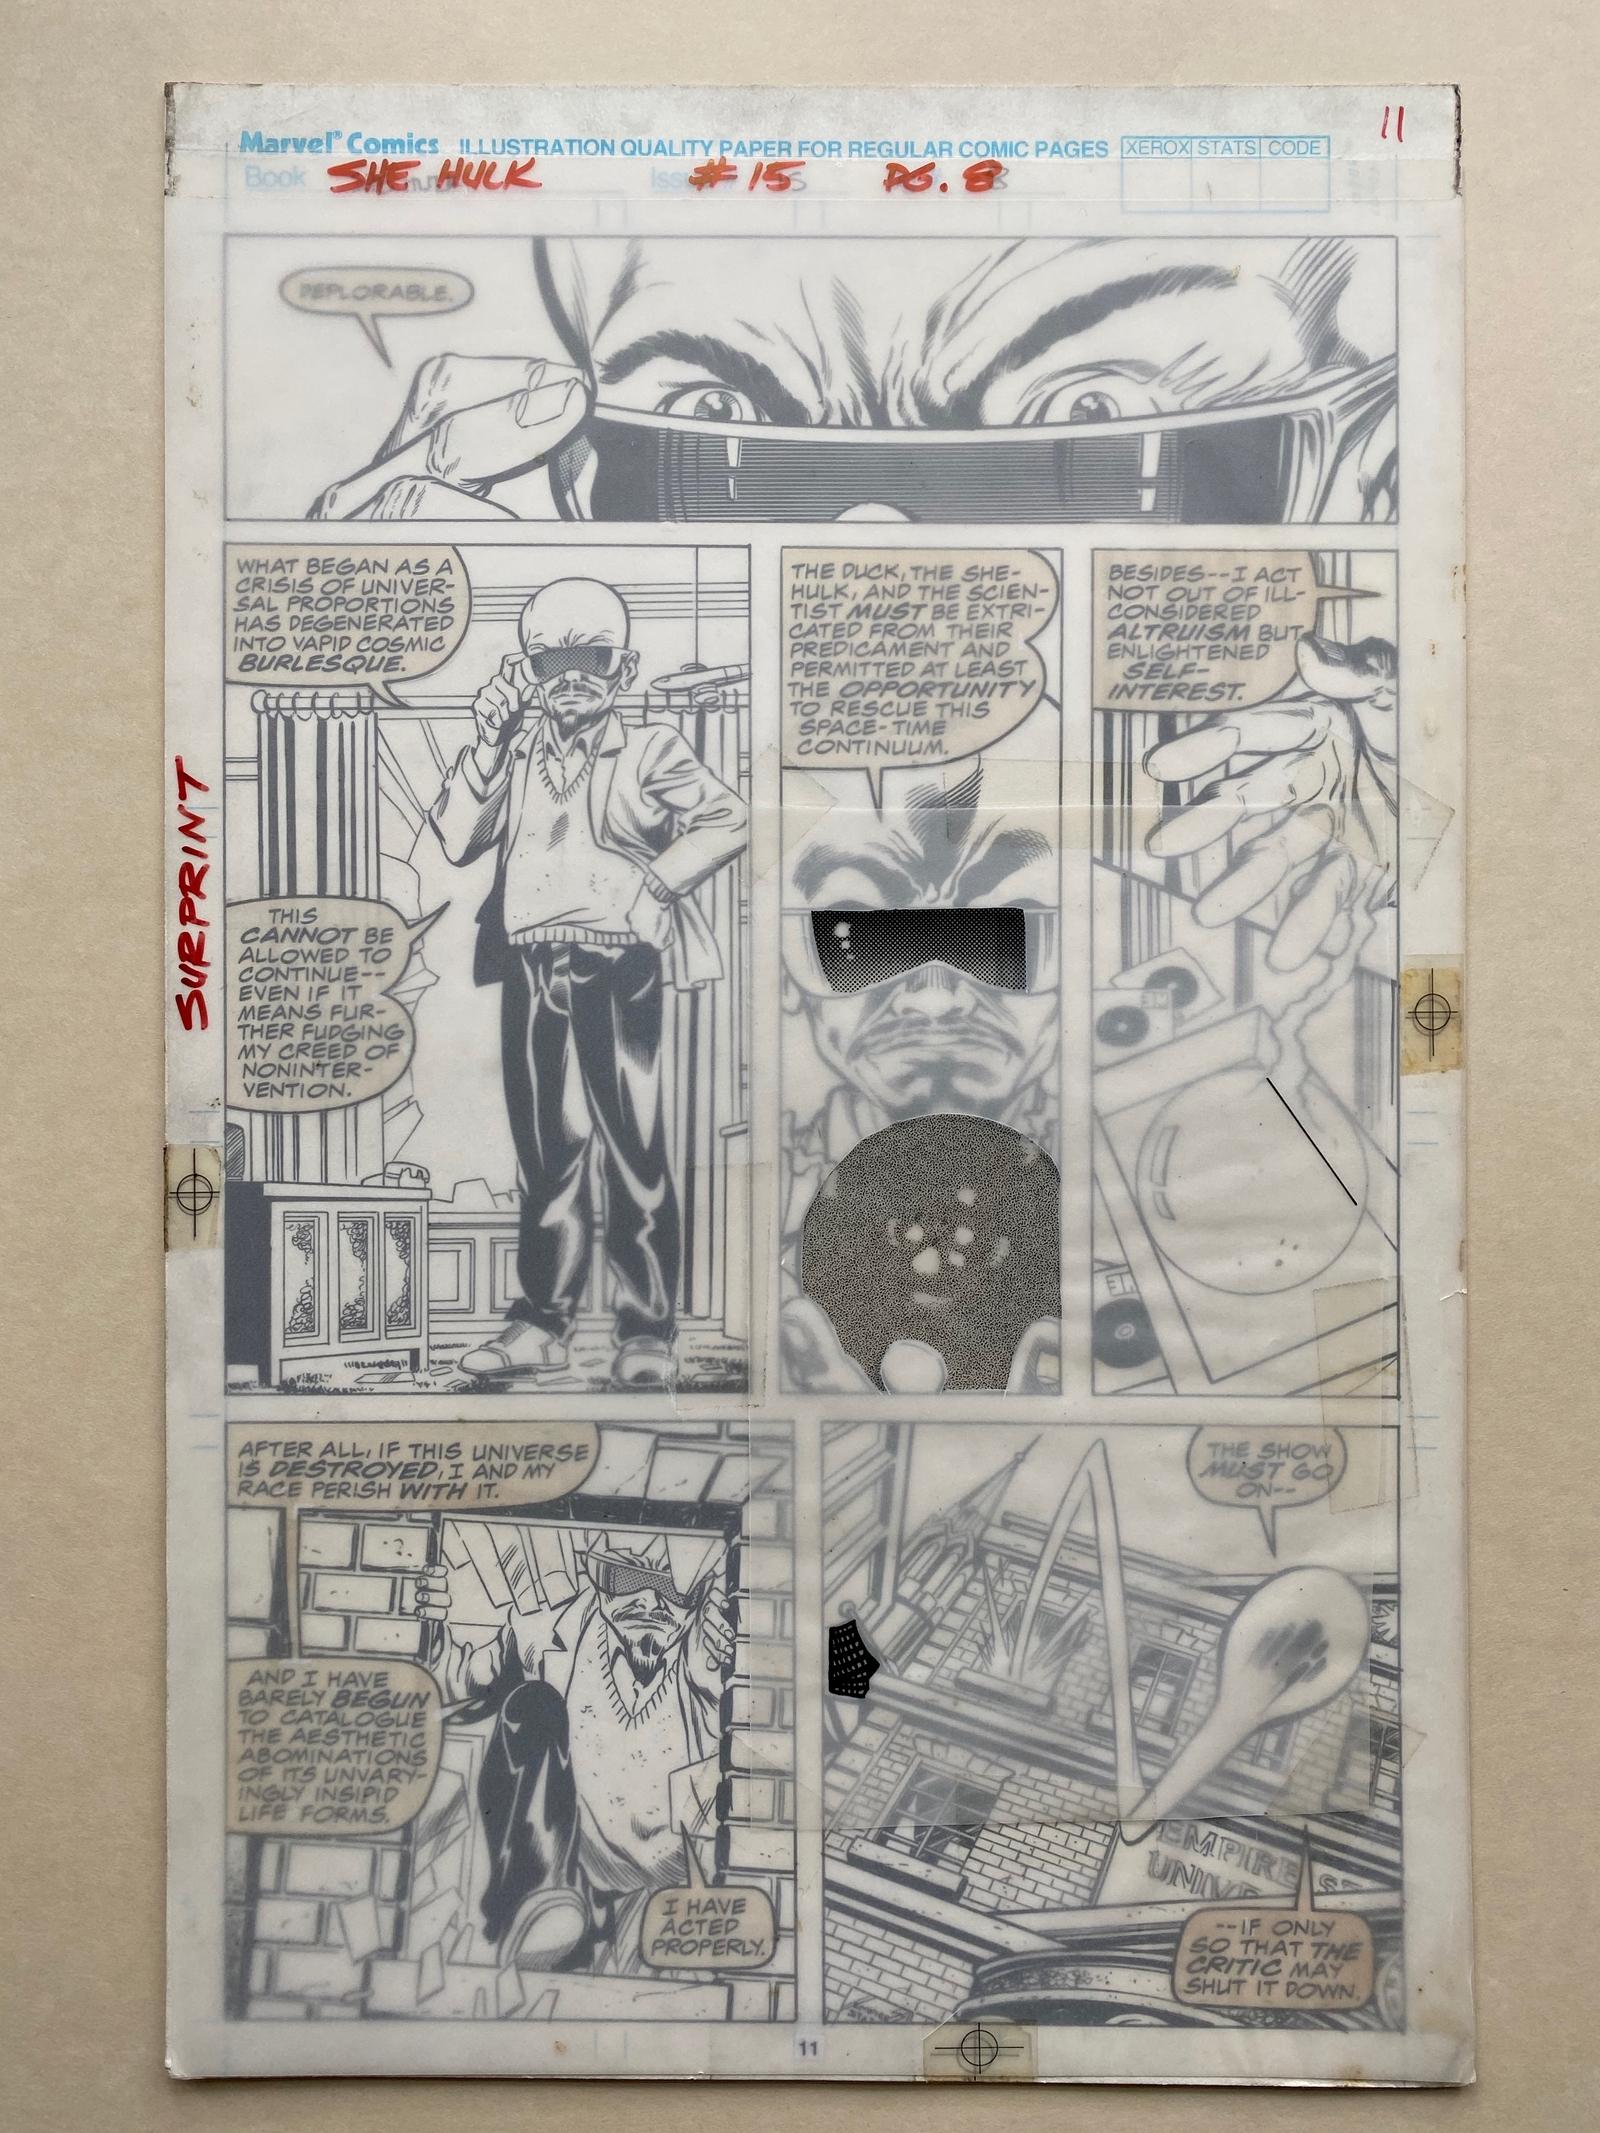 Lot 2222 - SENSATIONAL SHE-HULK #15 (1990) - ORIGINAL ARTWORK - BRYAN HITCH (Artist) JIM SANDERS (Inker) - Page